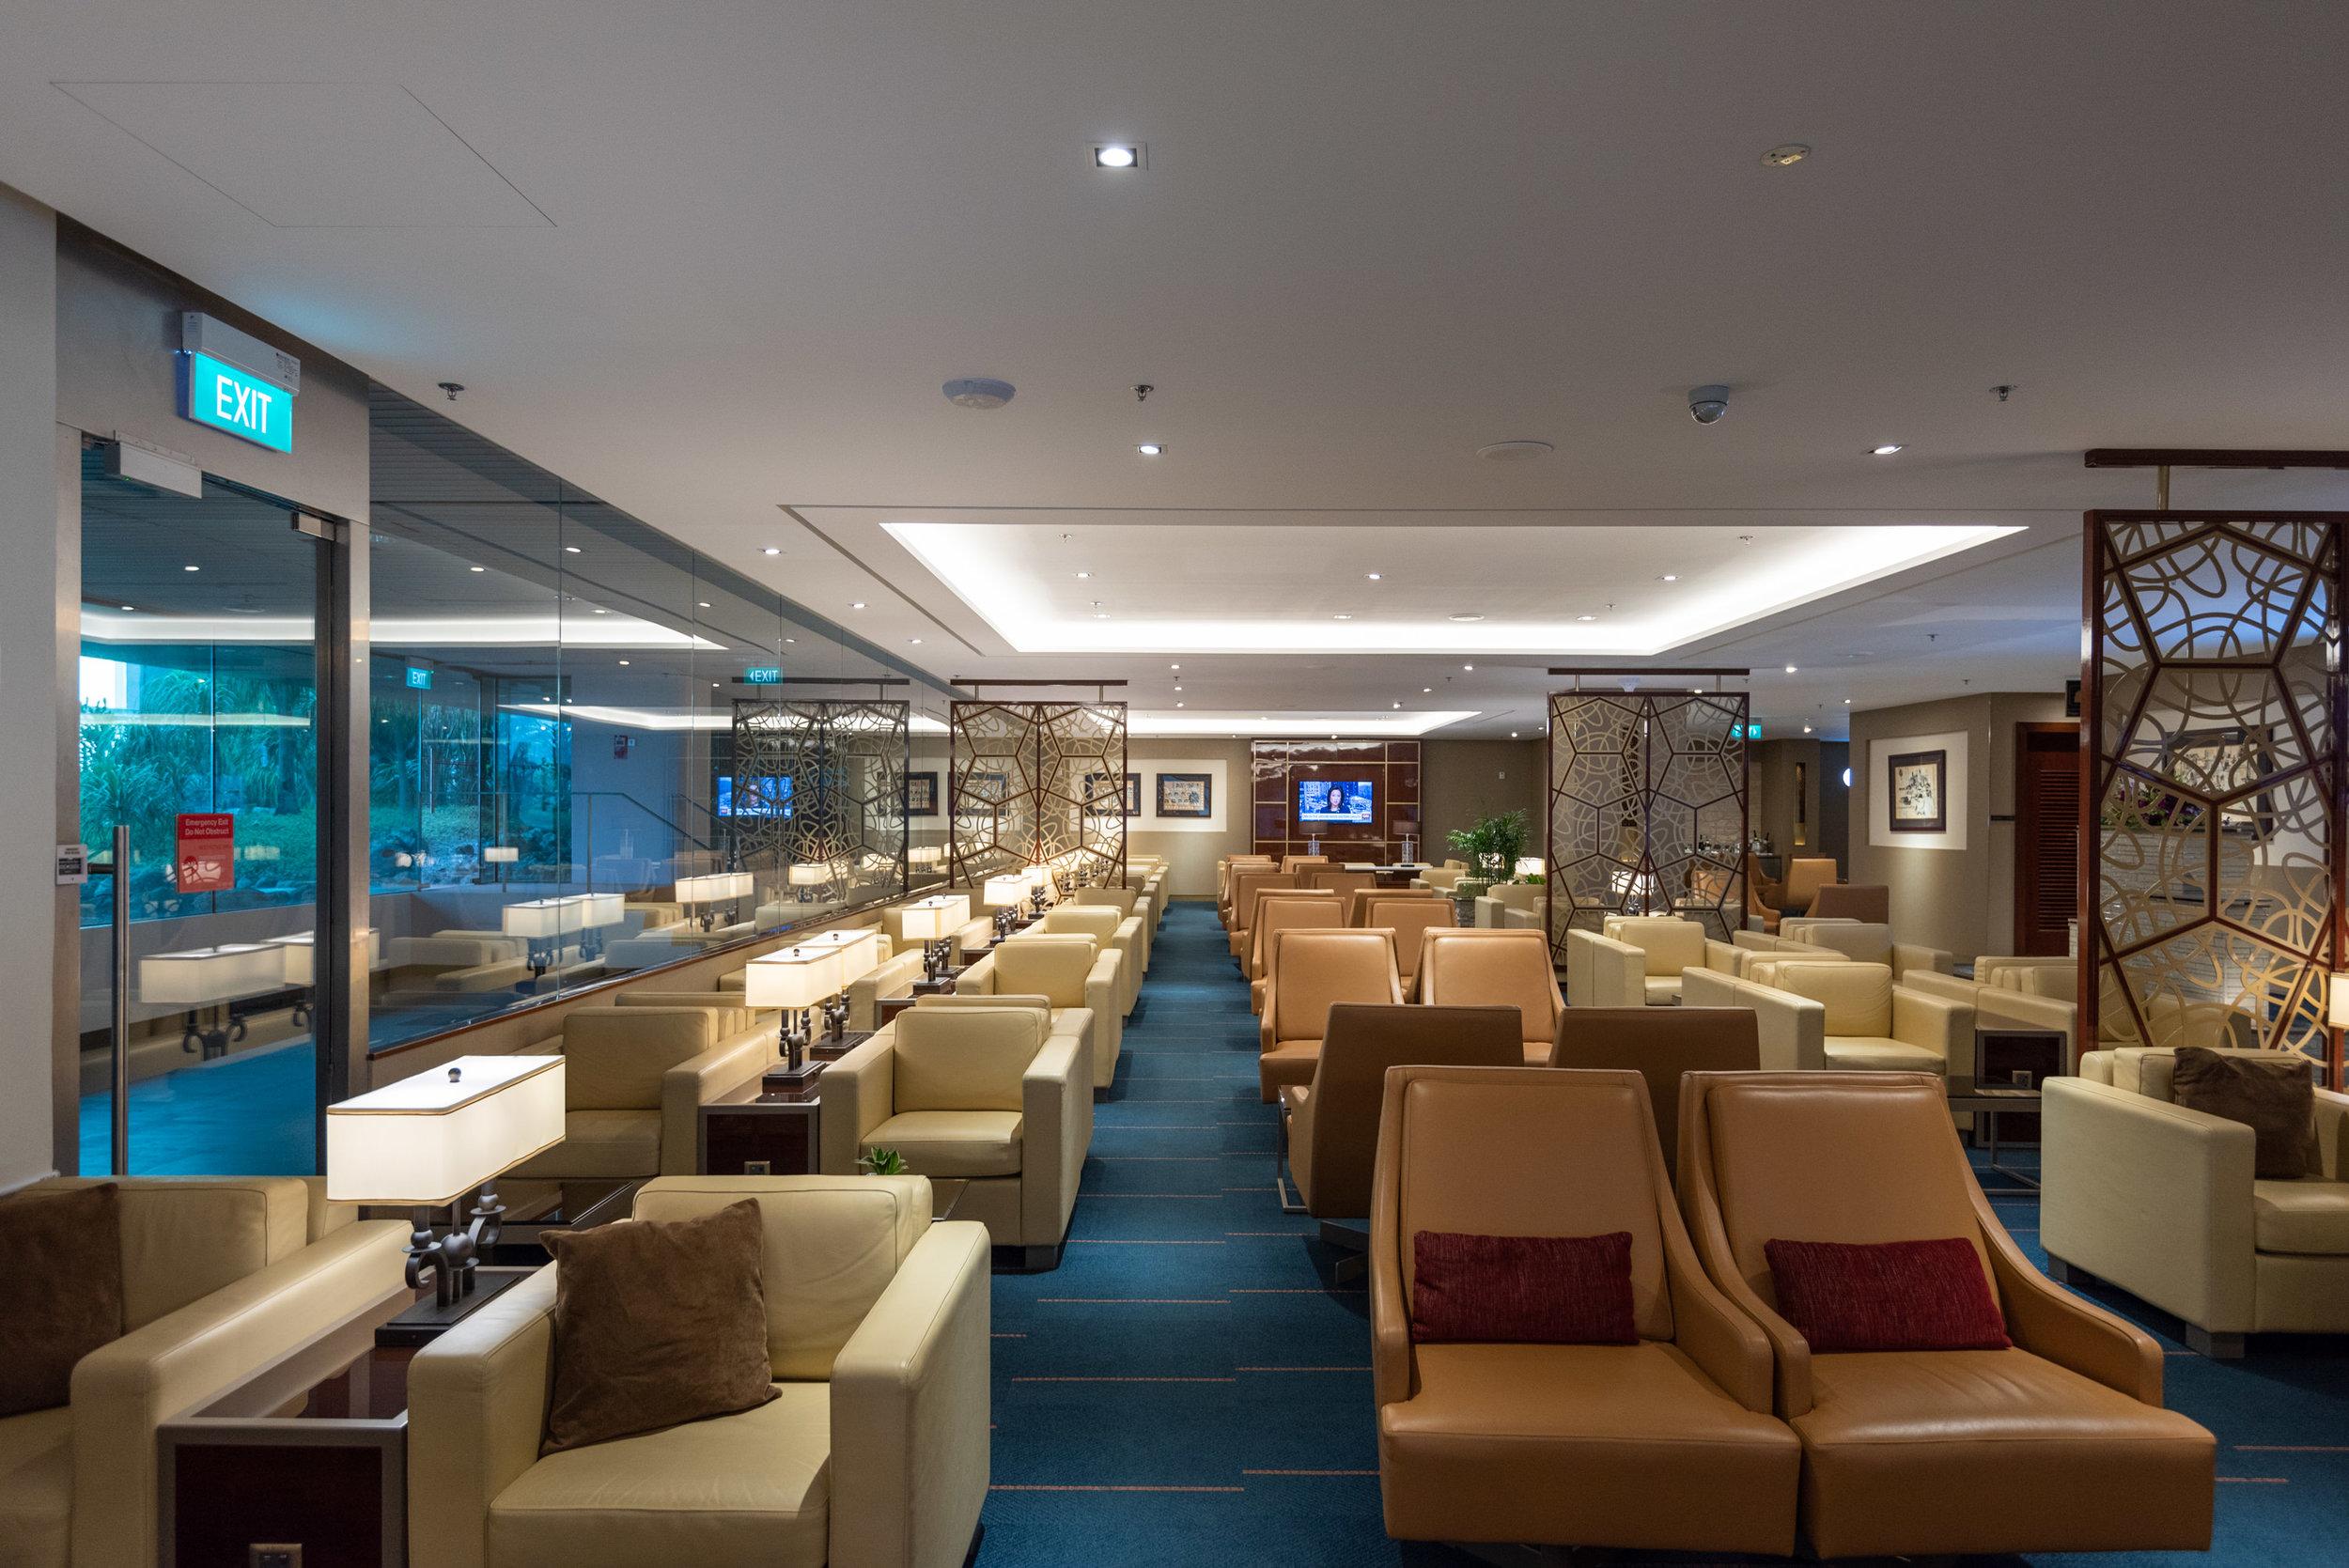 Emirates Lounge Review - Singapore Changi Airport (SIN)